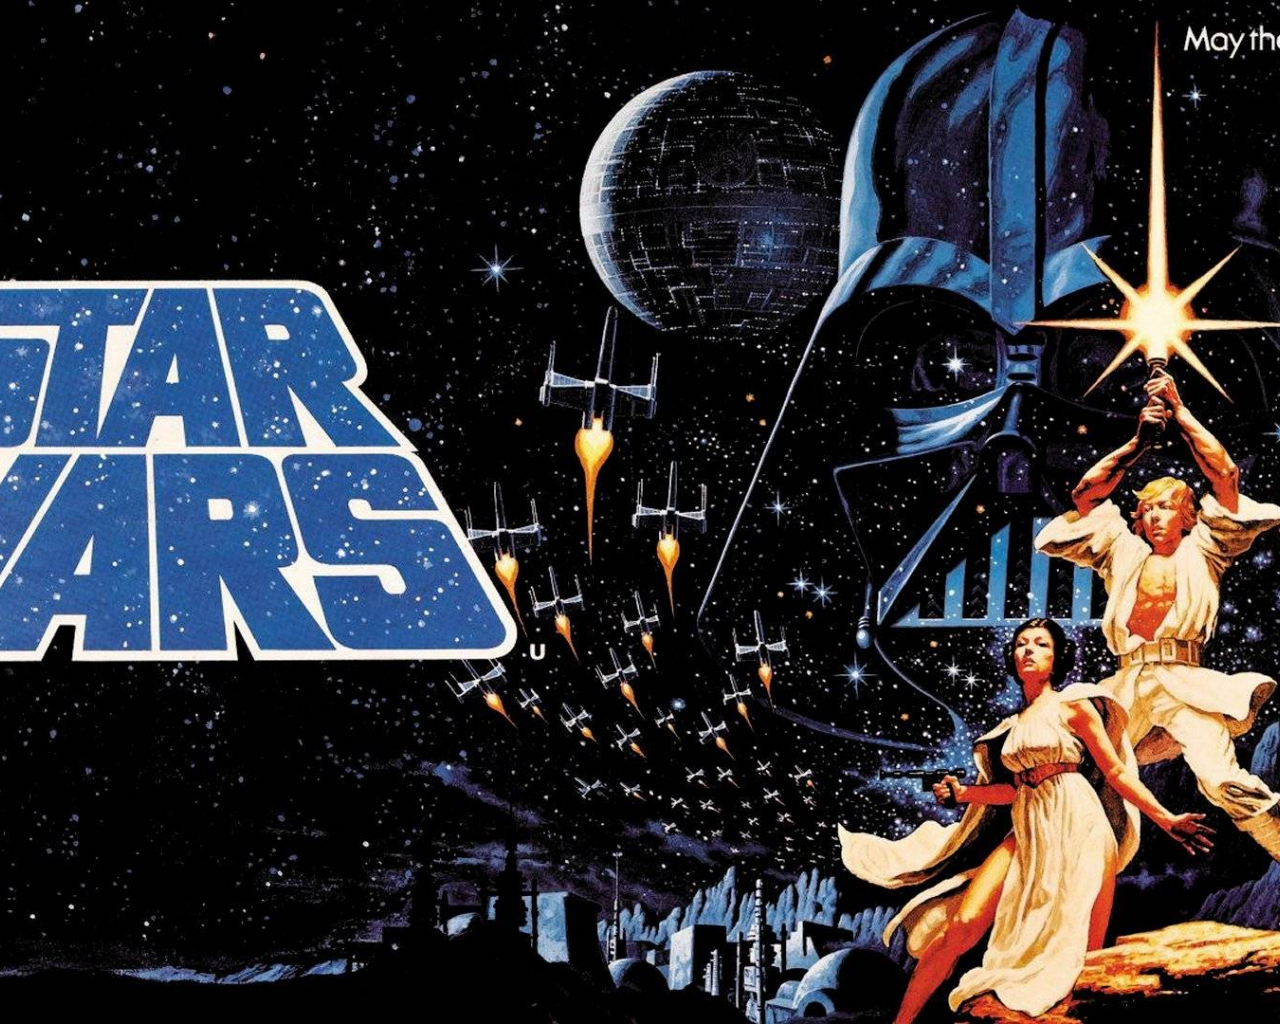 Free Download Star Wars Wallpaper Star Wars Original Trilogy Wallpaper 1920x1080 For Your Desktop Mobile Tablet Explore 49 1977 Star Wars Wallpaper Star Wars Wallpaper For Walls Star Wars